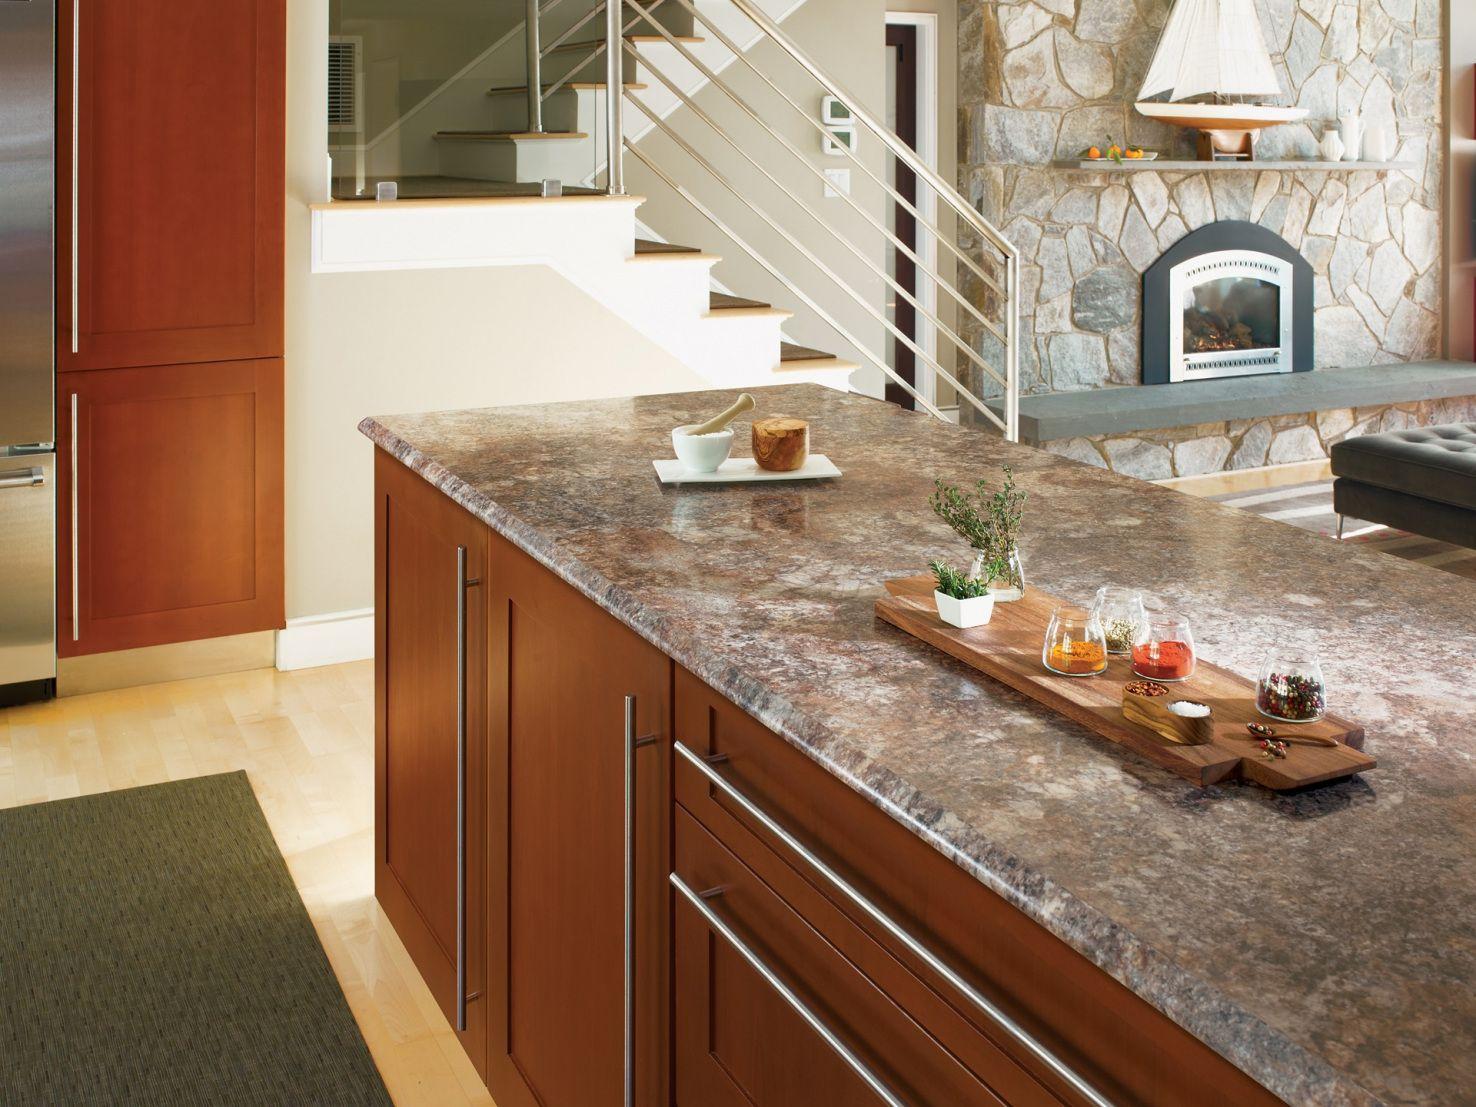 2019 Lowes Granite Bathroom Countertops Unique Kitchen Backsplash Ideas Check More At Http